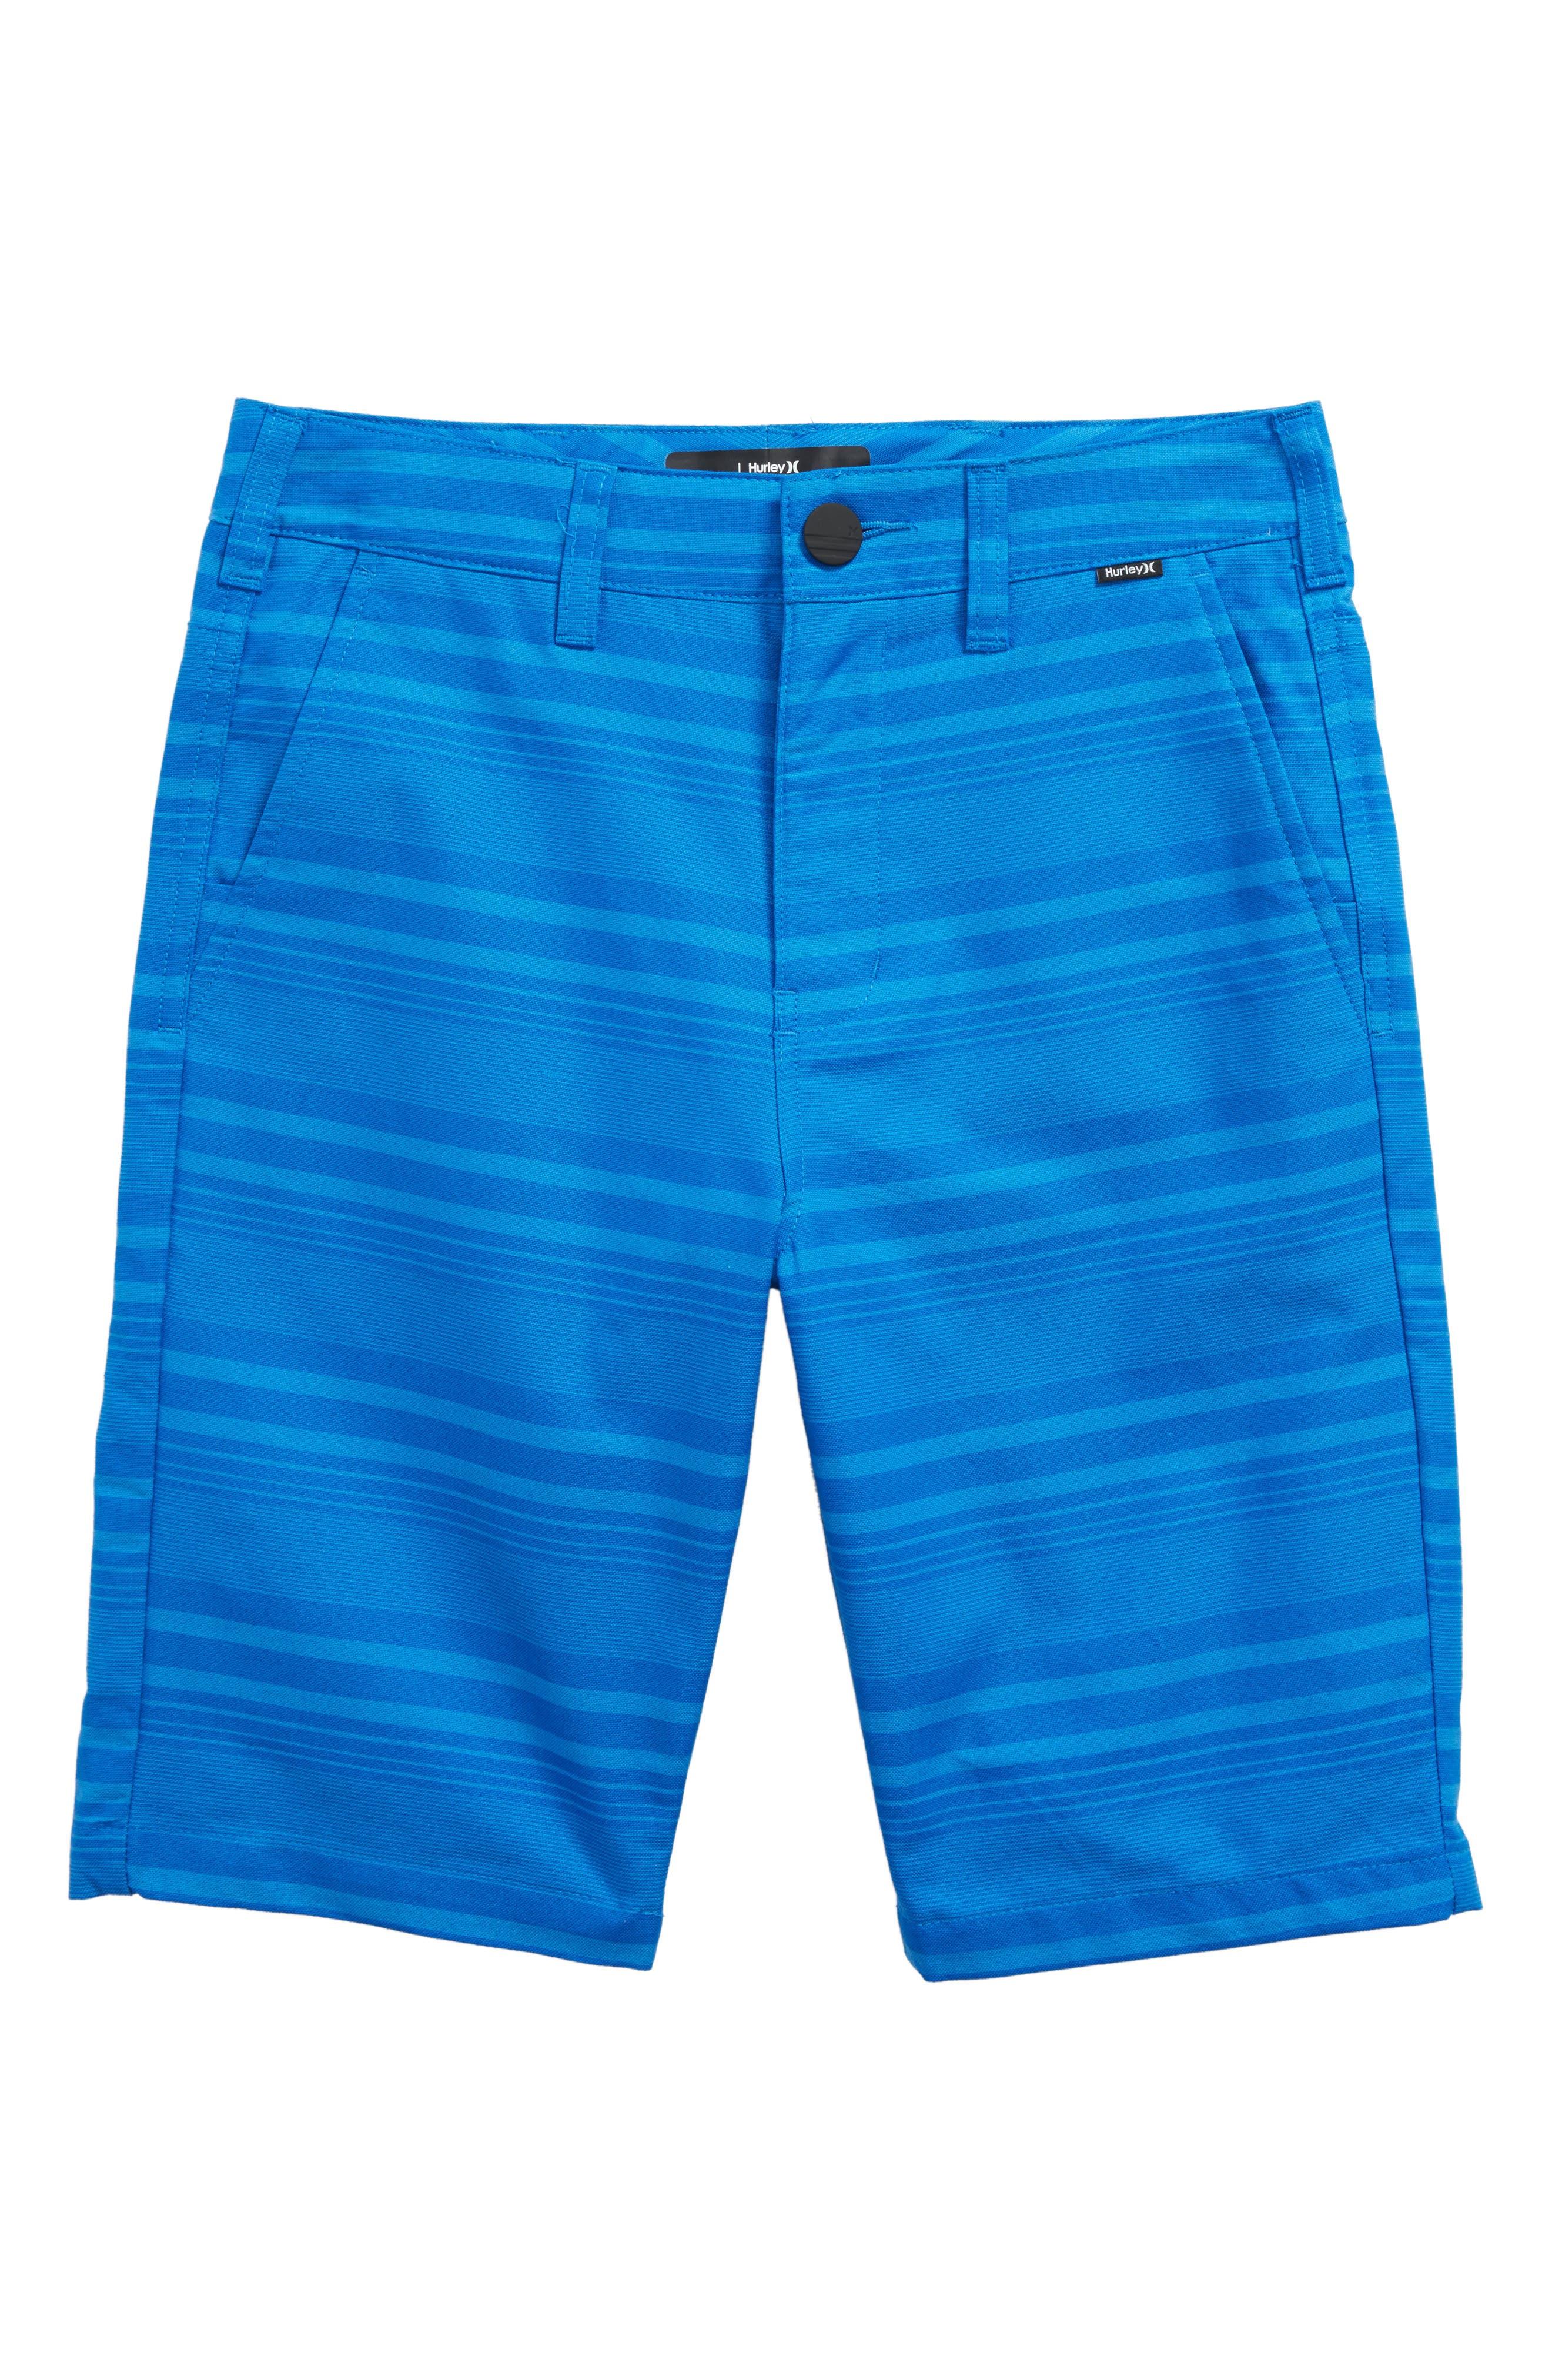 Jones Hybrid Shorts,                         Main,                         color, Fountain Blue